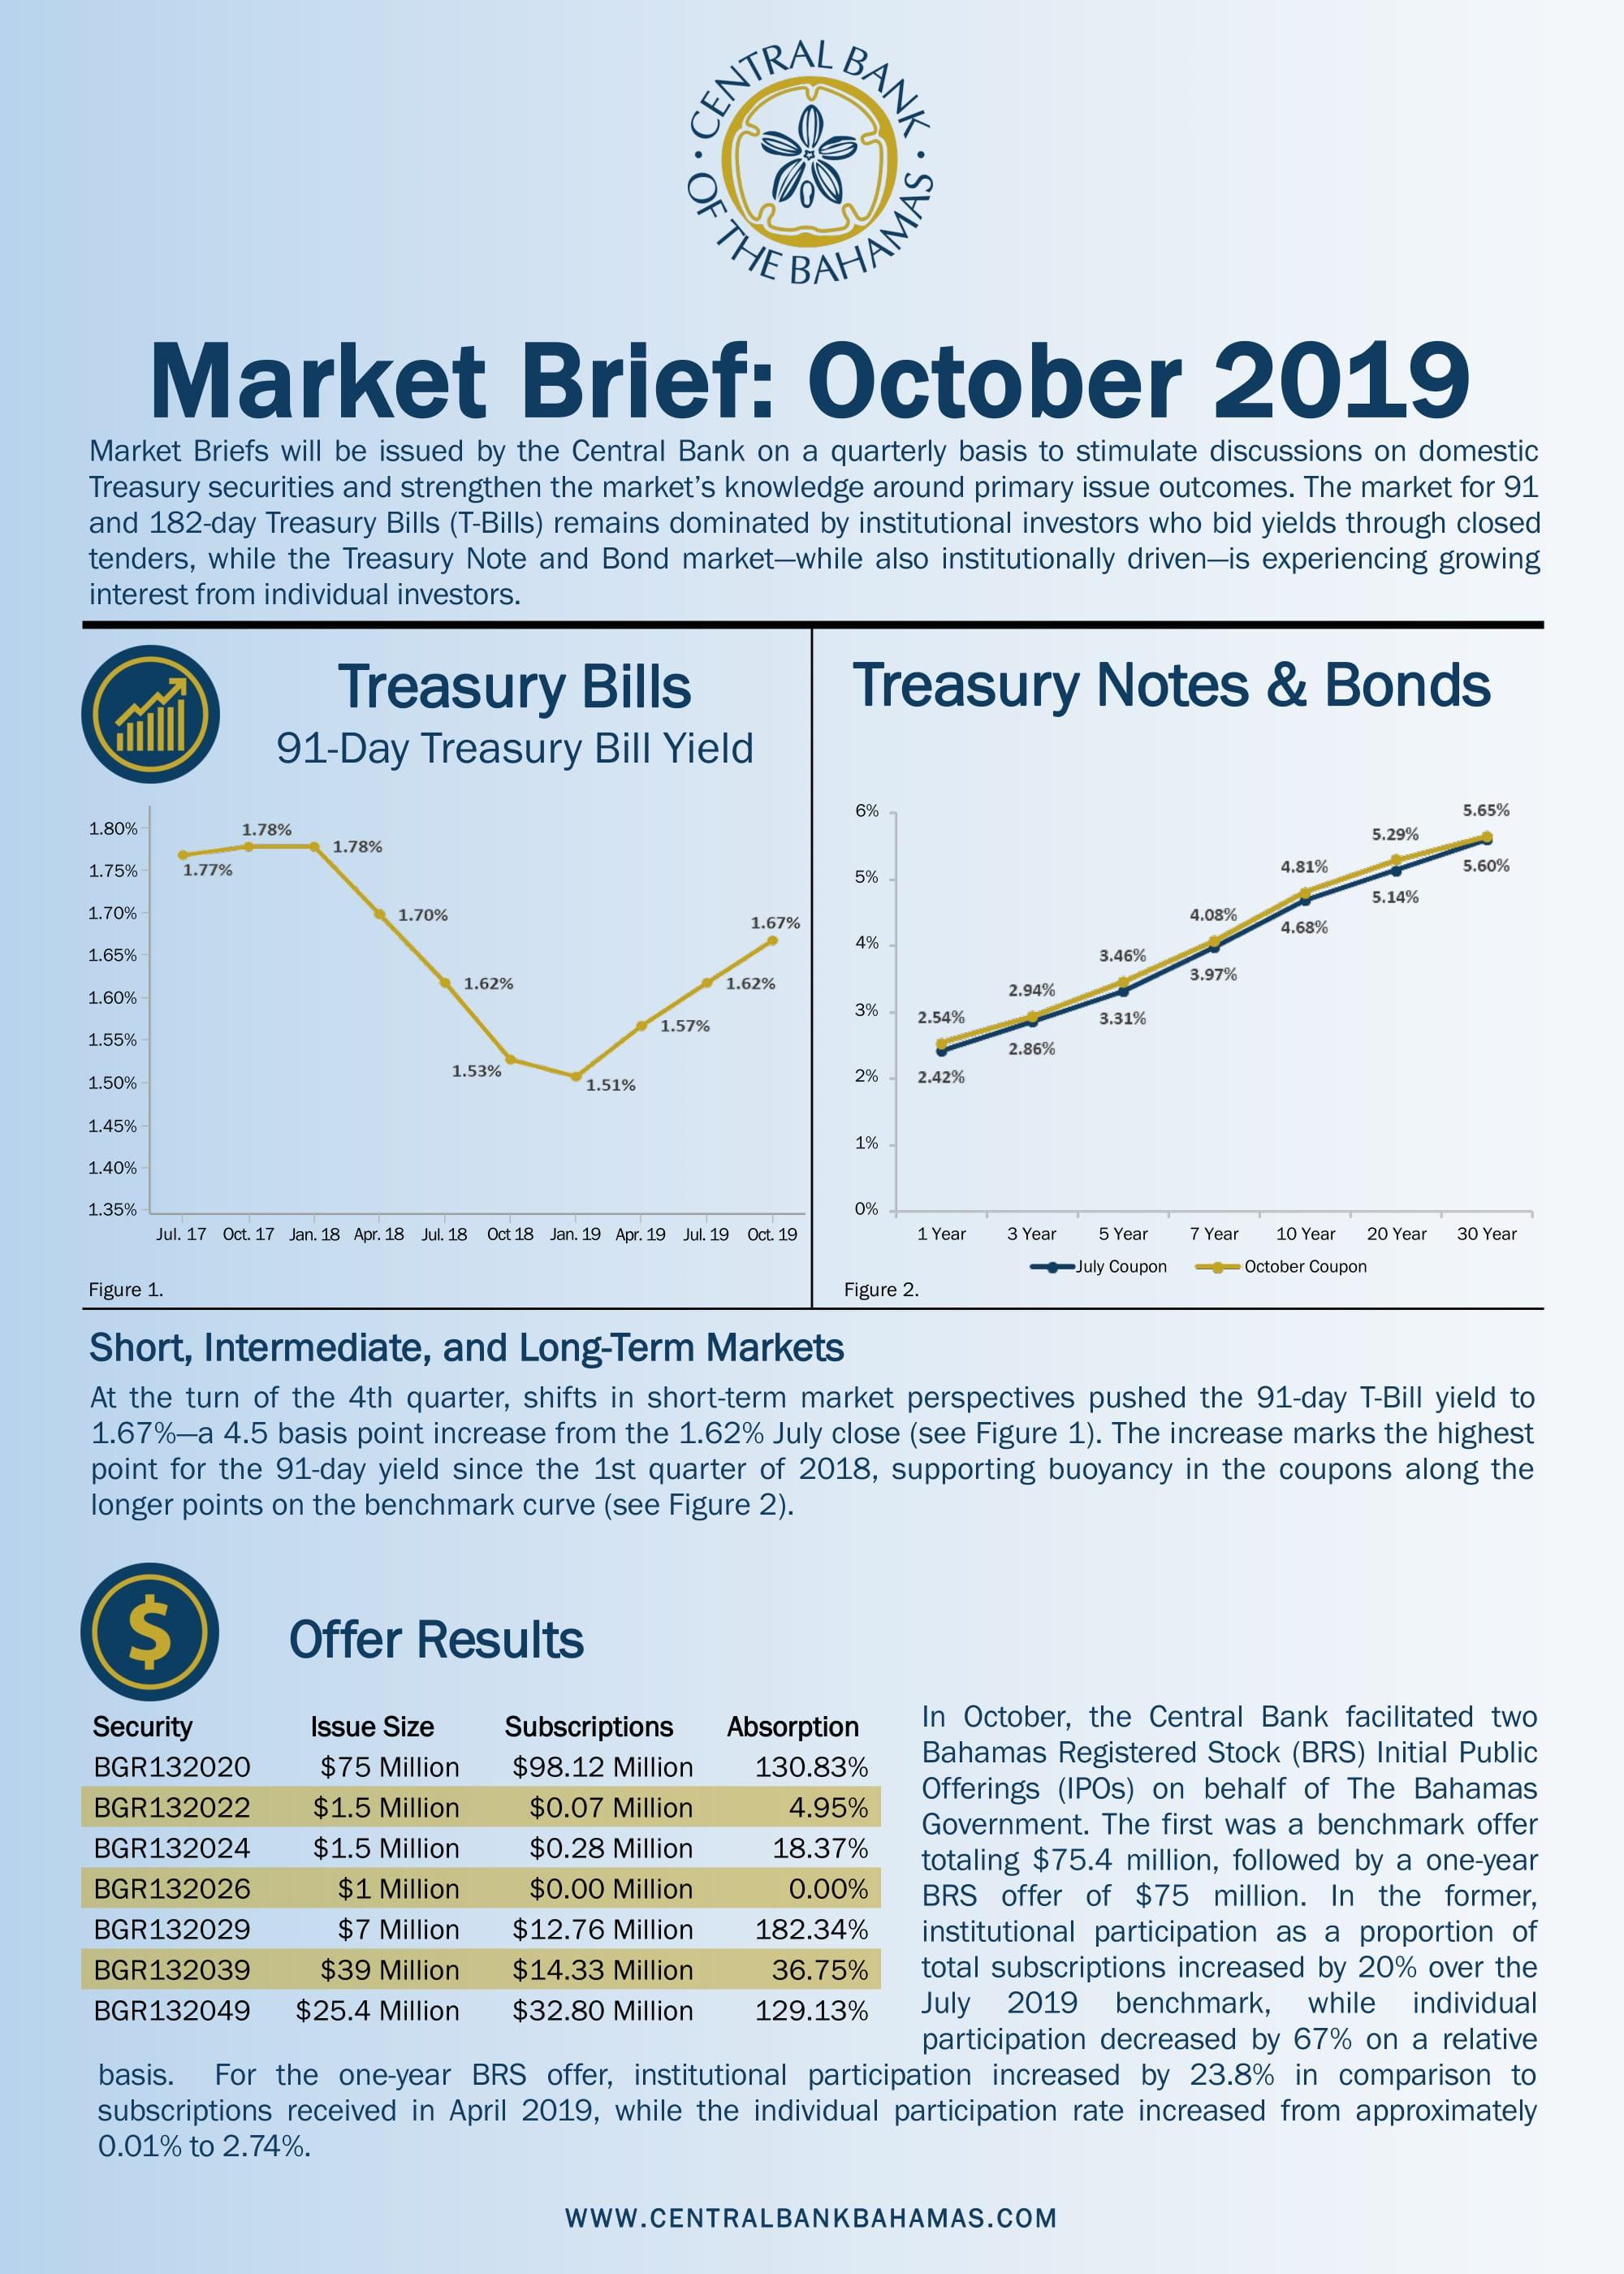 Market Brief October 2019